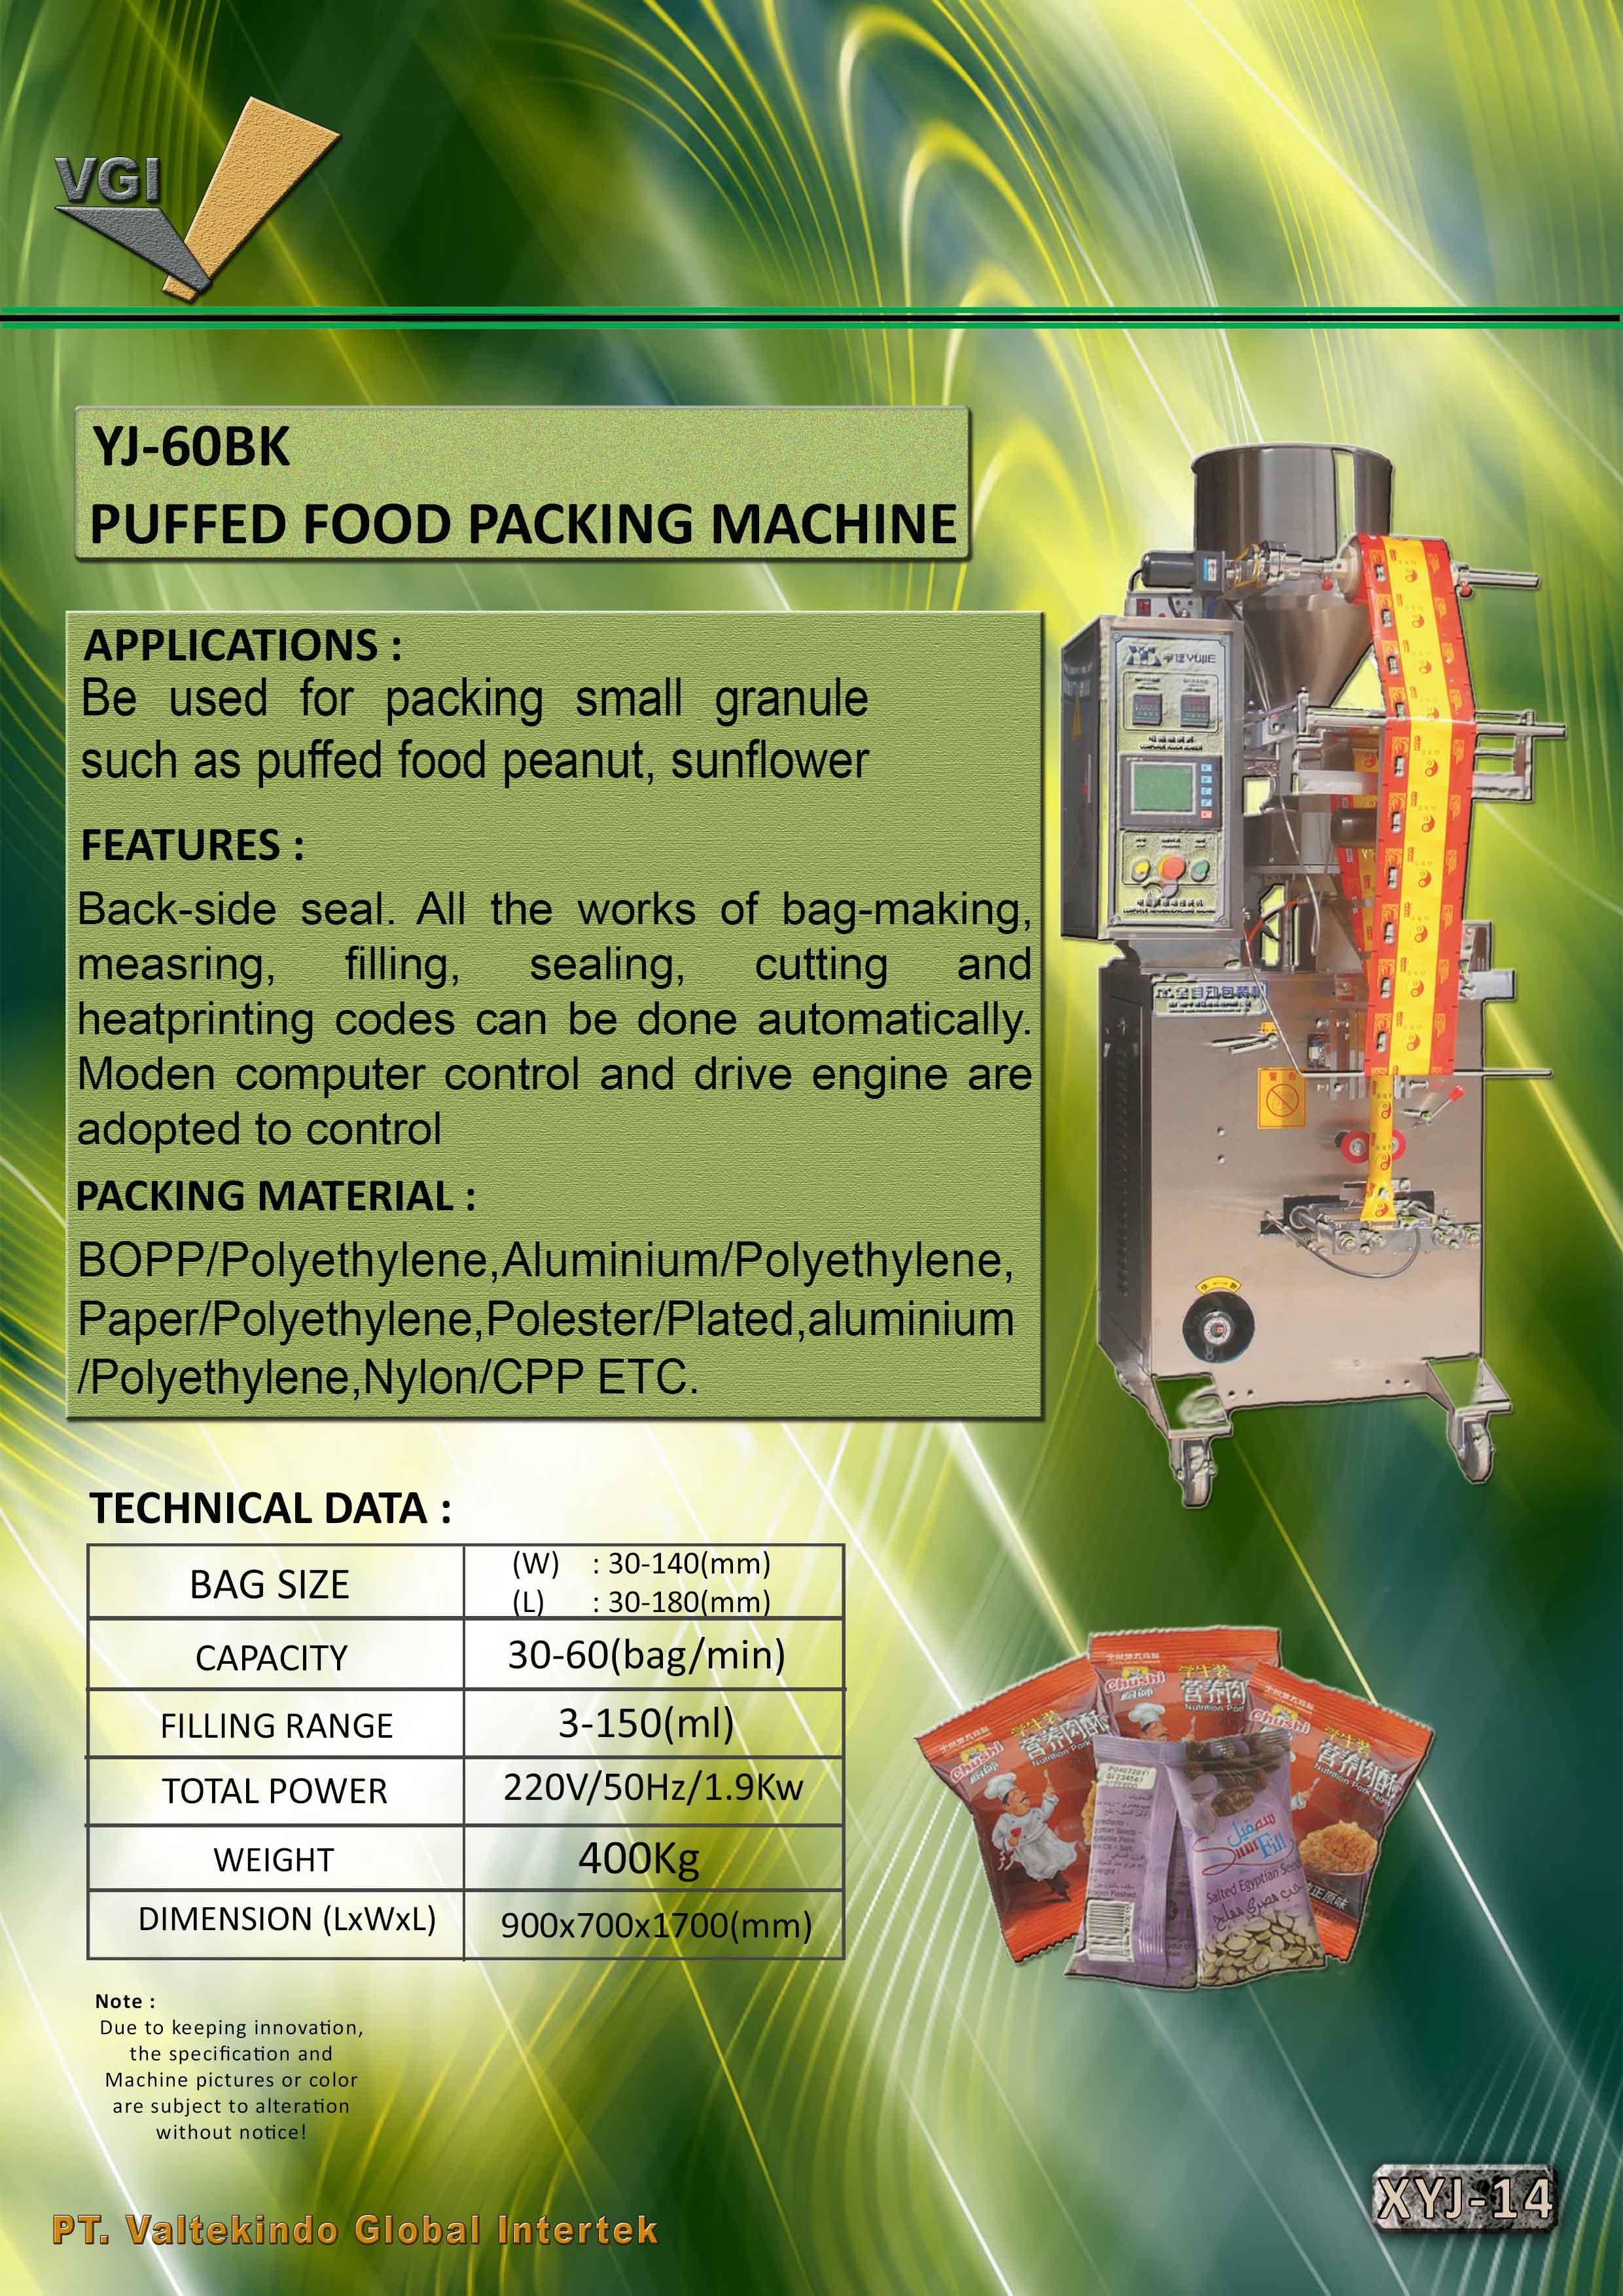 jual mesin Puffed Food Packing Machine Puffed Food Packing Machine